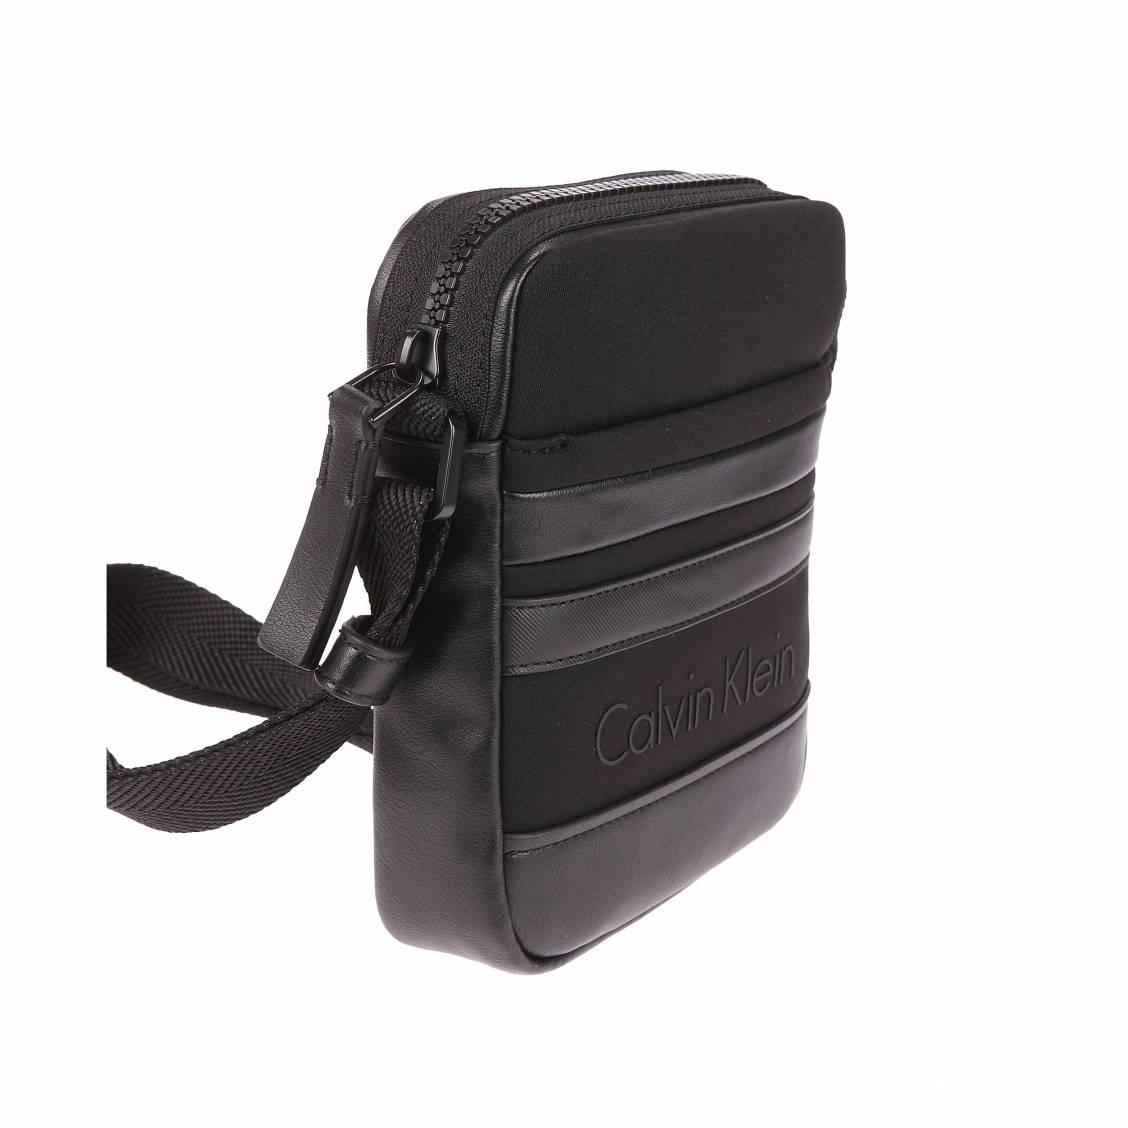 Sacoche Calvin Klein Jeans Neo Graphic bi-matière noire I2RQMaC0T7